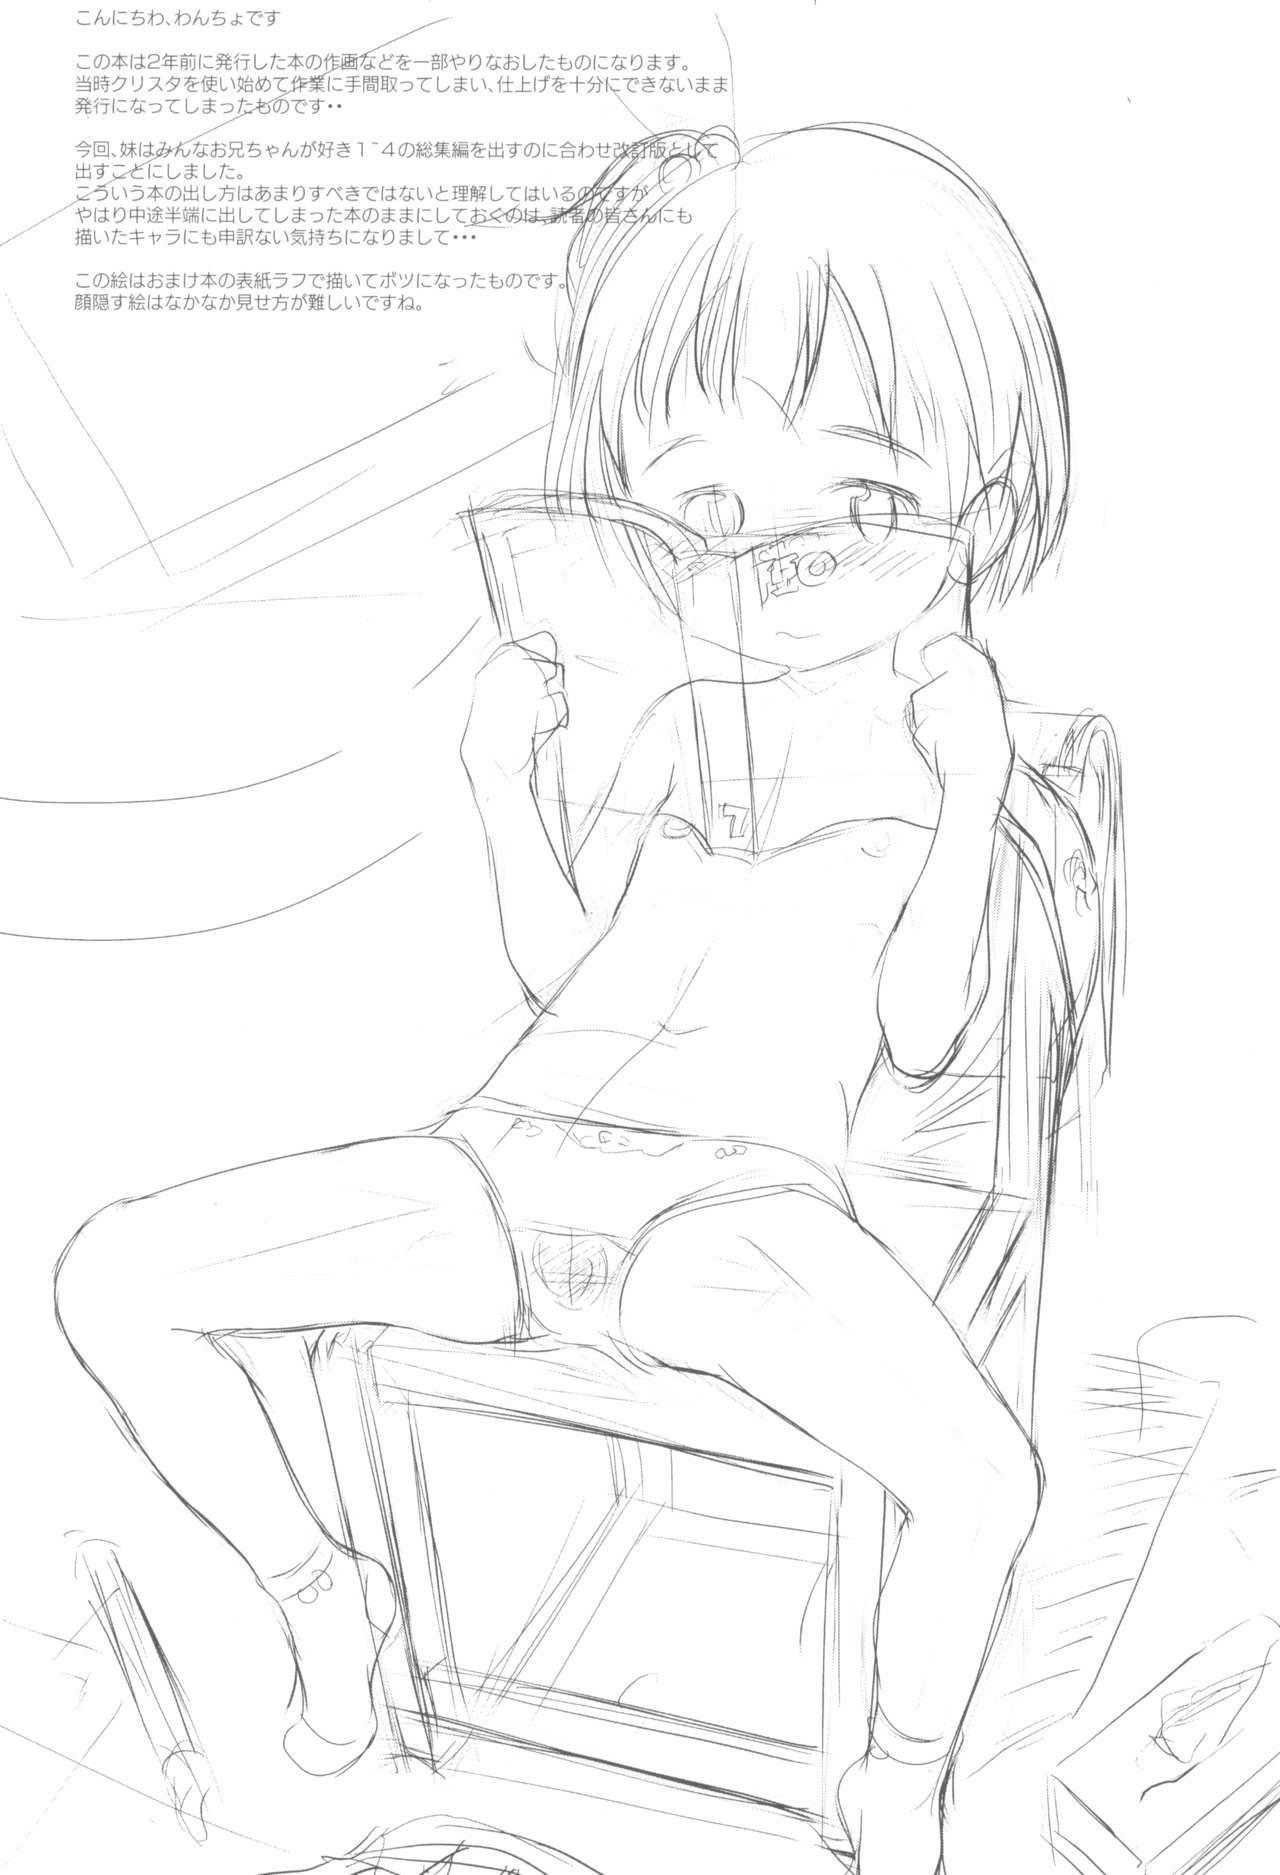 (C97) [Wancho-ke (Wancho)] Imouto wa Minna Onii-chan ga Suki! 5-Kaiteiban- 3